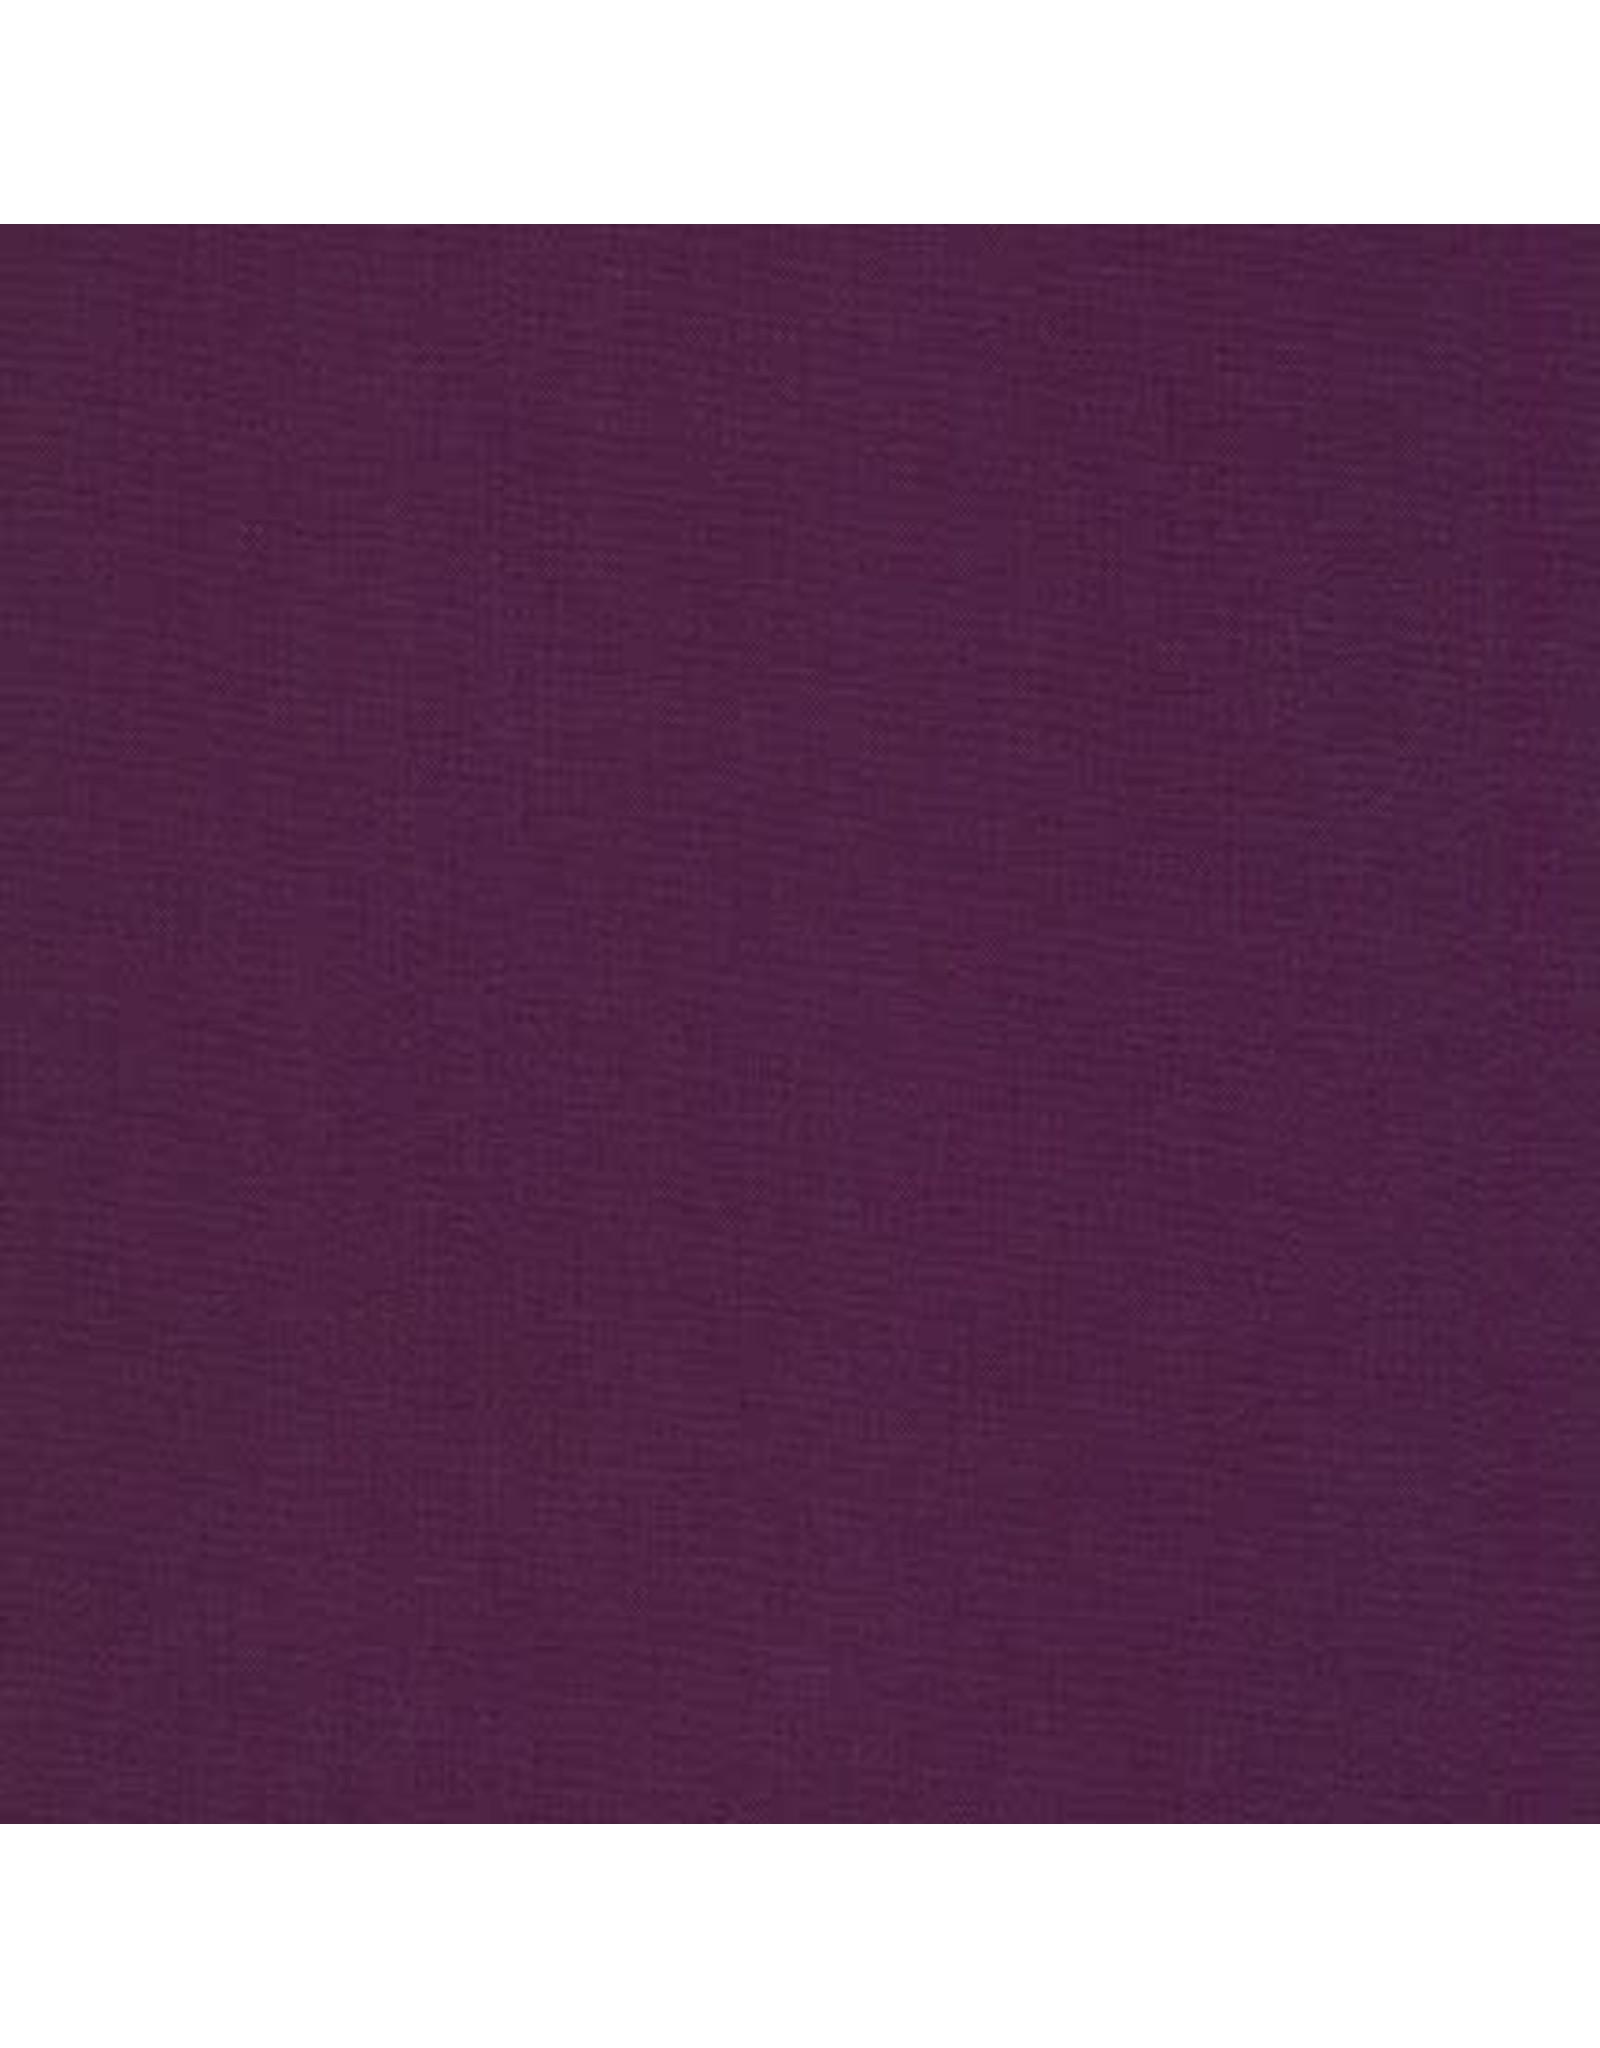 Robert Kaufman Kona Cotton in Hibiscus, Fabric Half-Yards